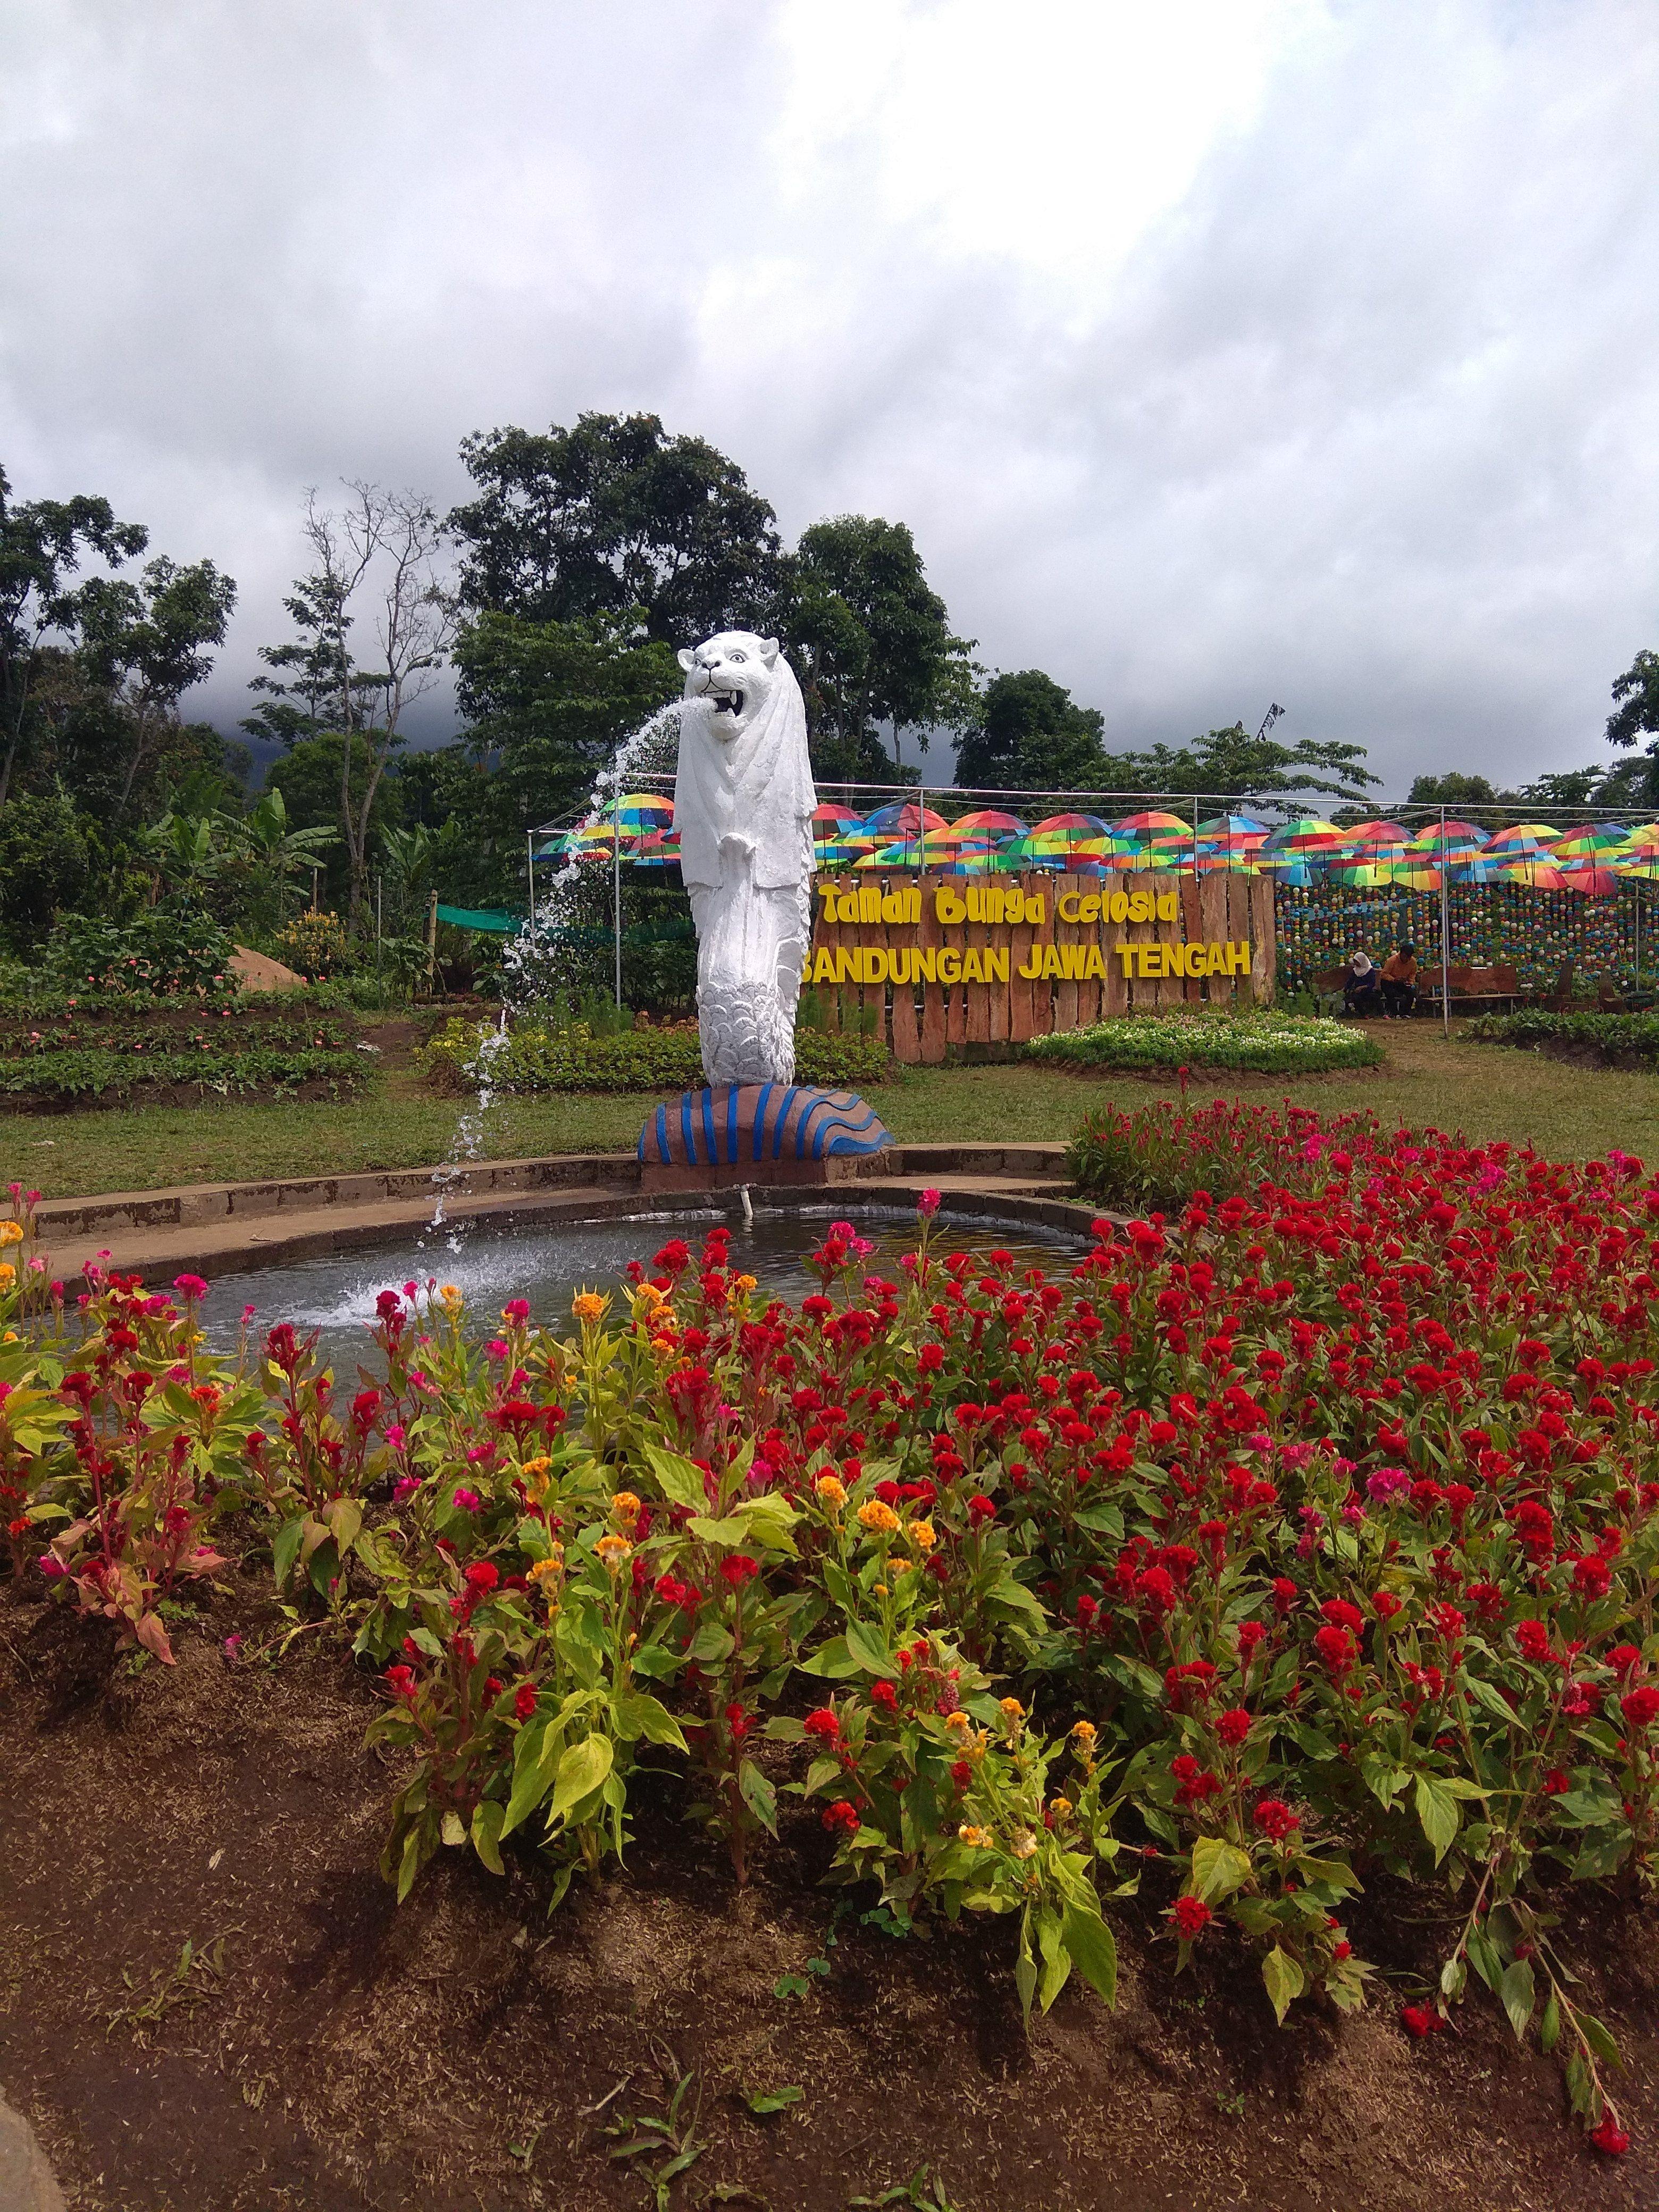 Foto Taman Bunga Di Semarang Wisata Yang Terletak Di Kawasan Candi Gedong Songo Bandungan Kabupaten Semarang Kalau Mau Foto Bunga Taman Bunga Gambar Bunga